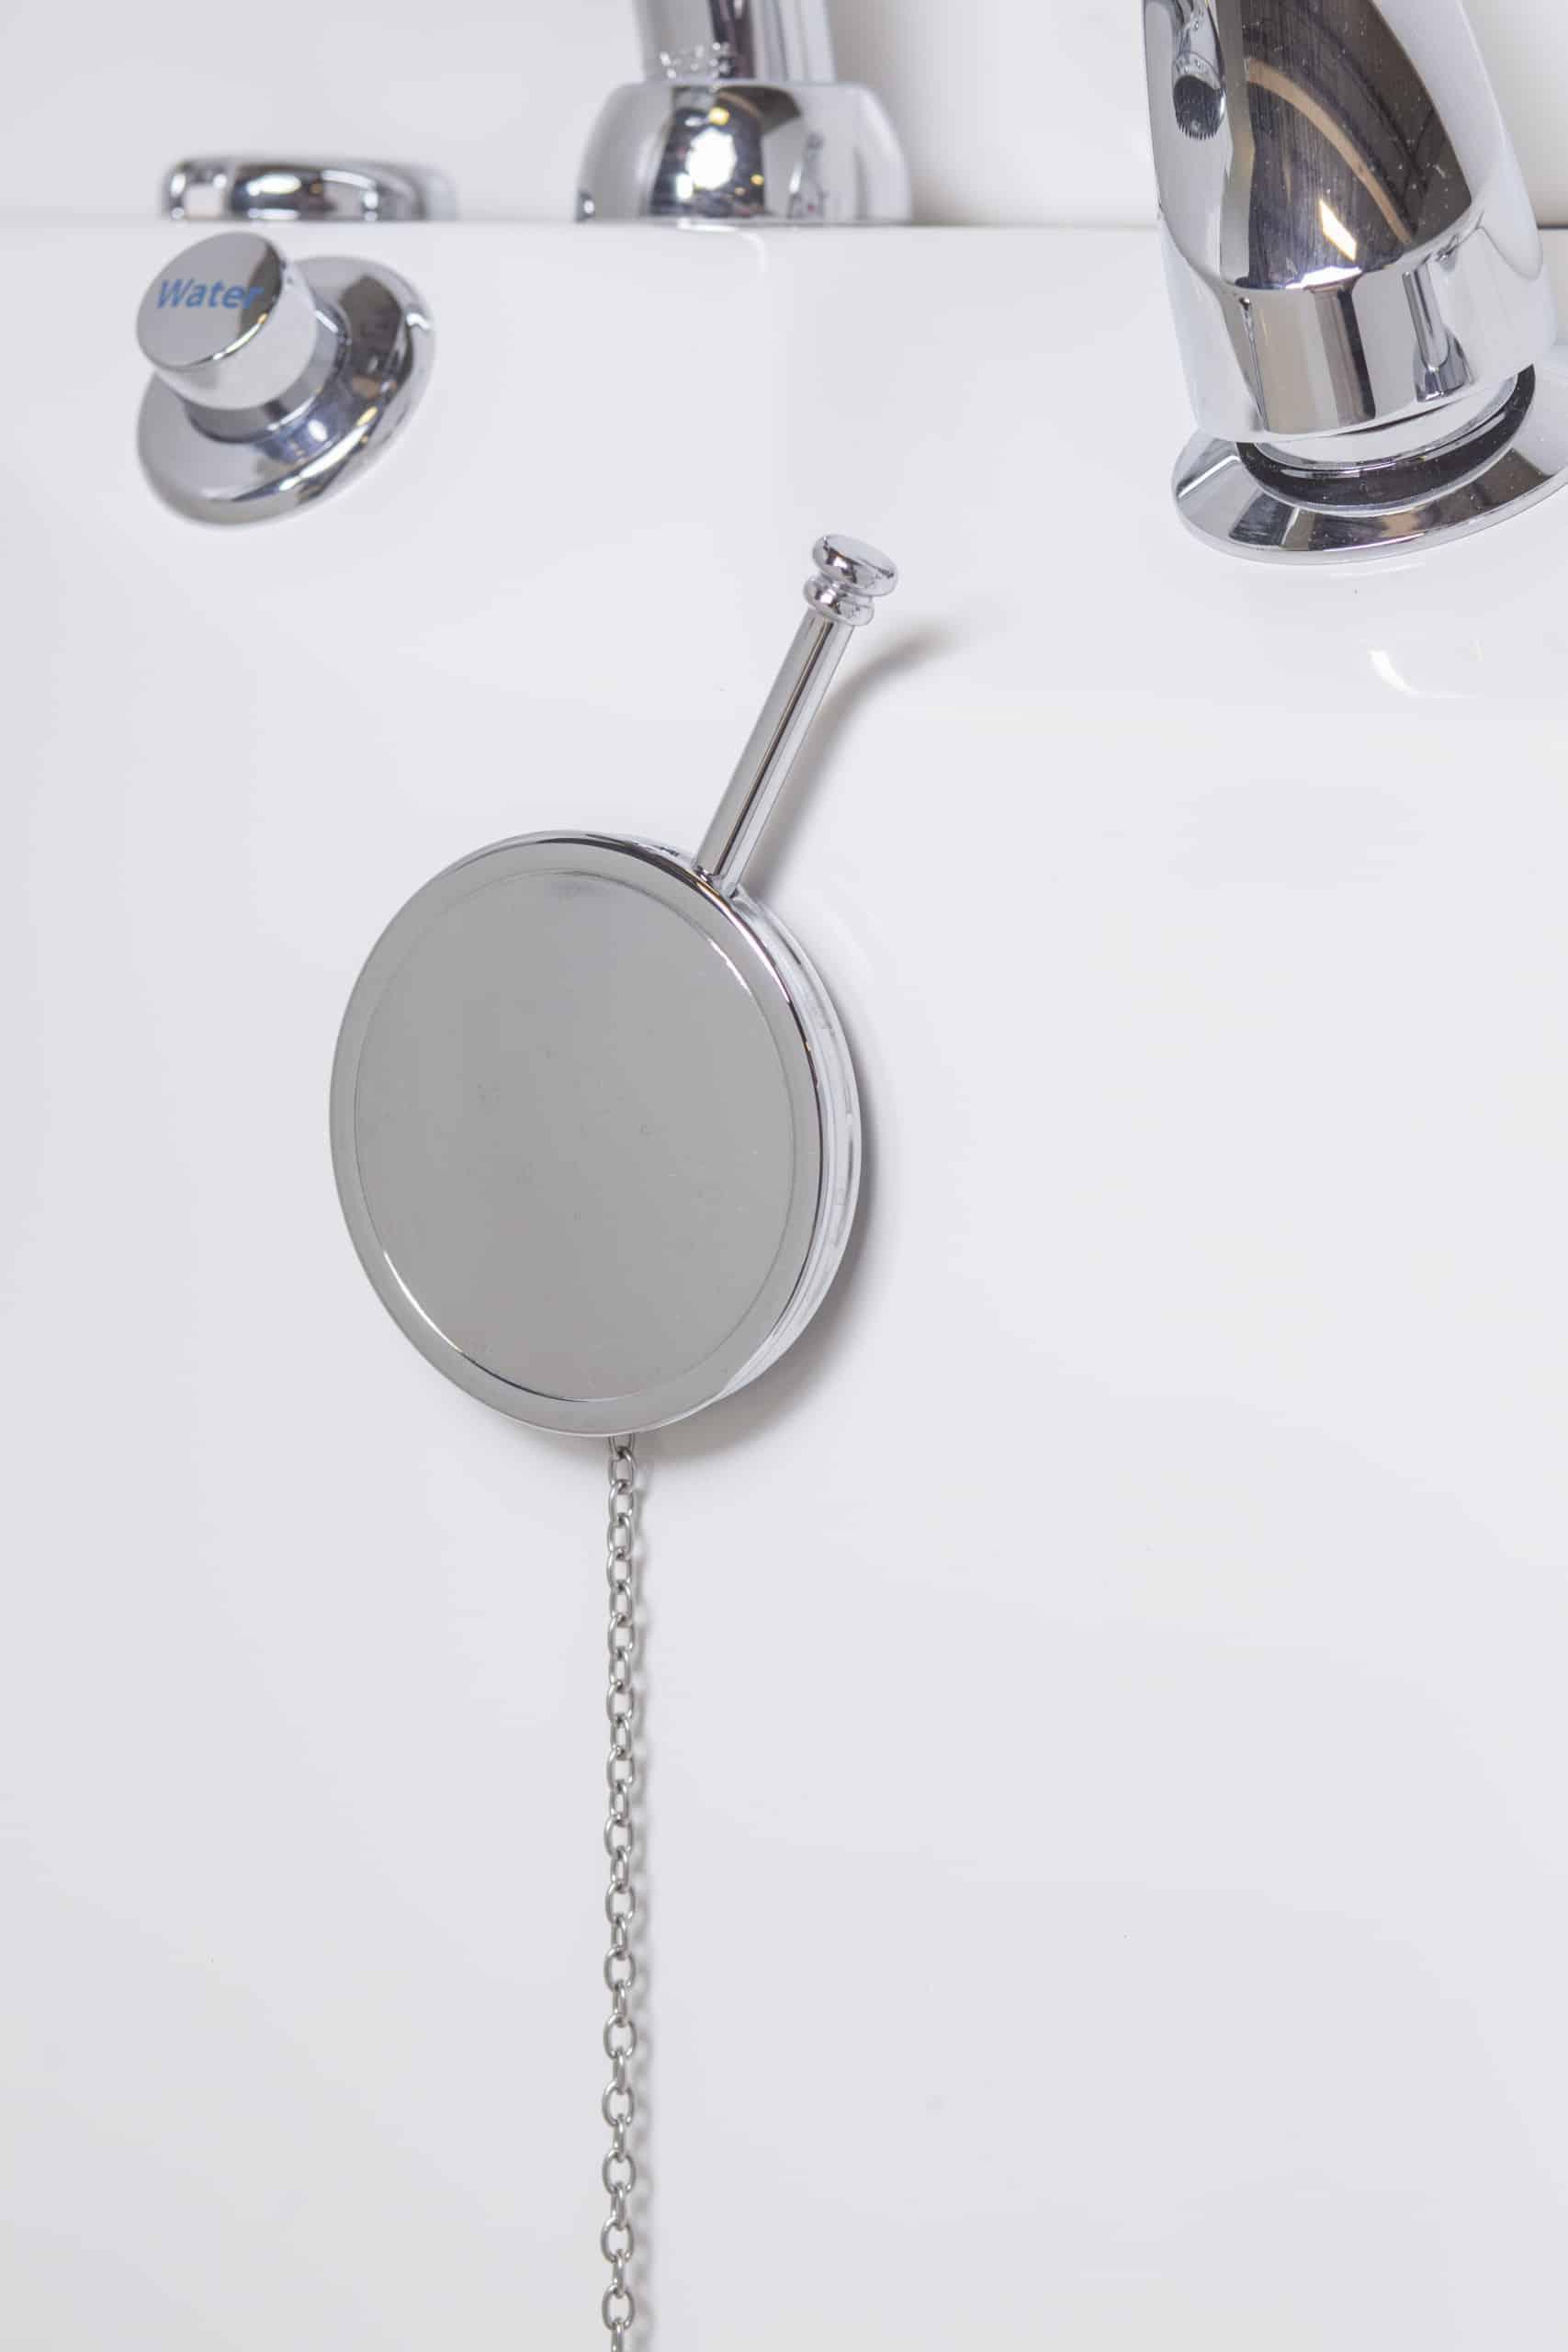 Rane Bathing Cable Drain Plug